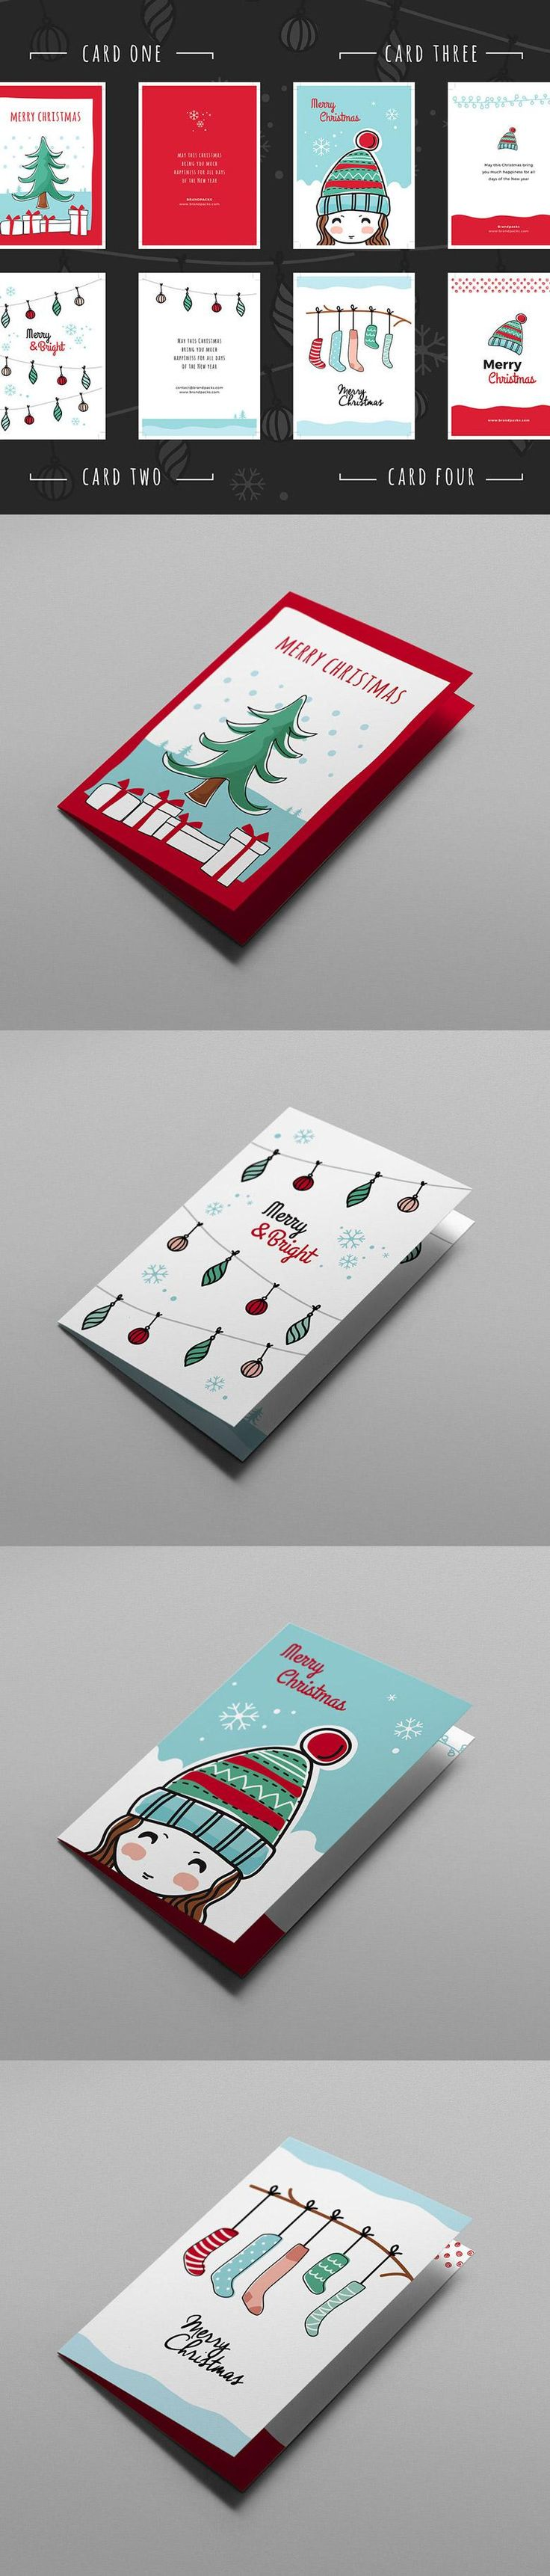 4 Free Christmas Card Templates